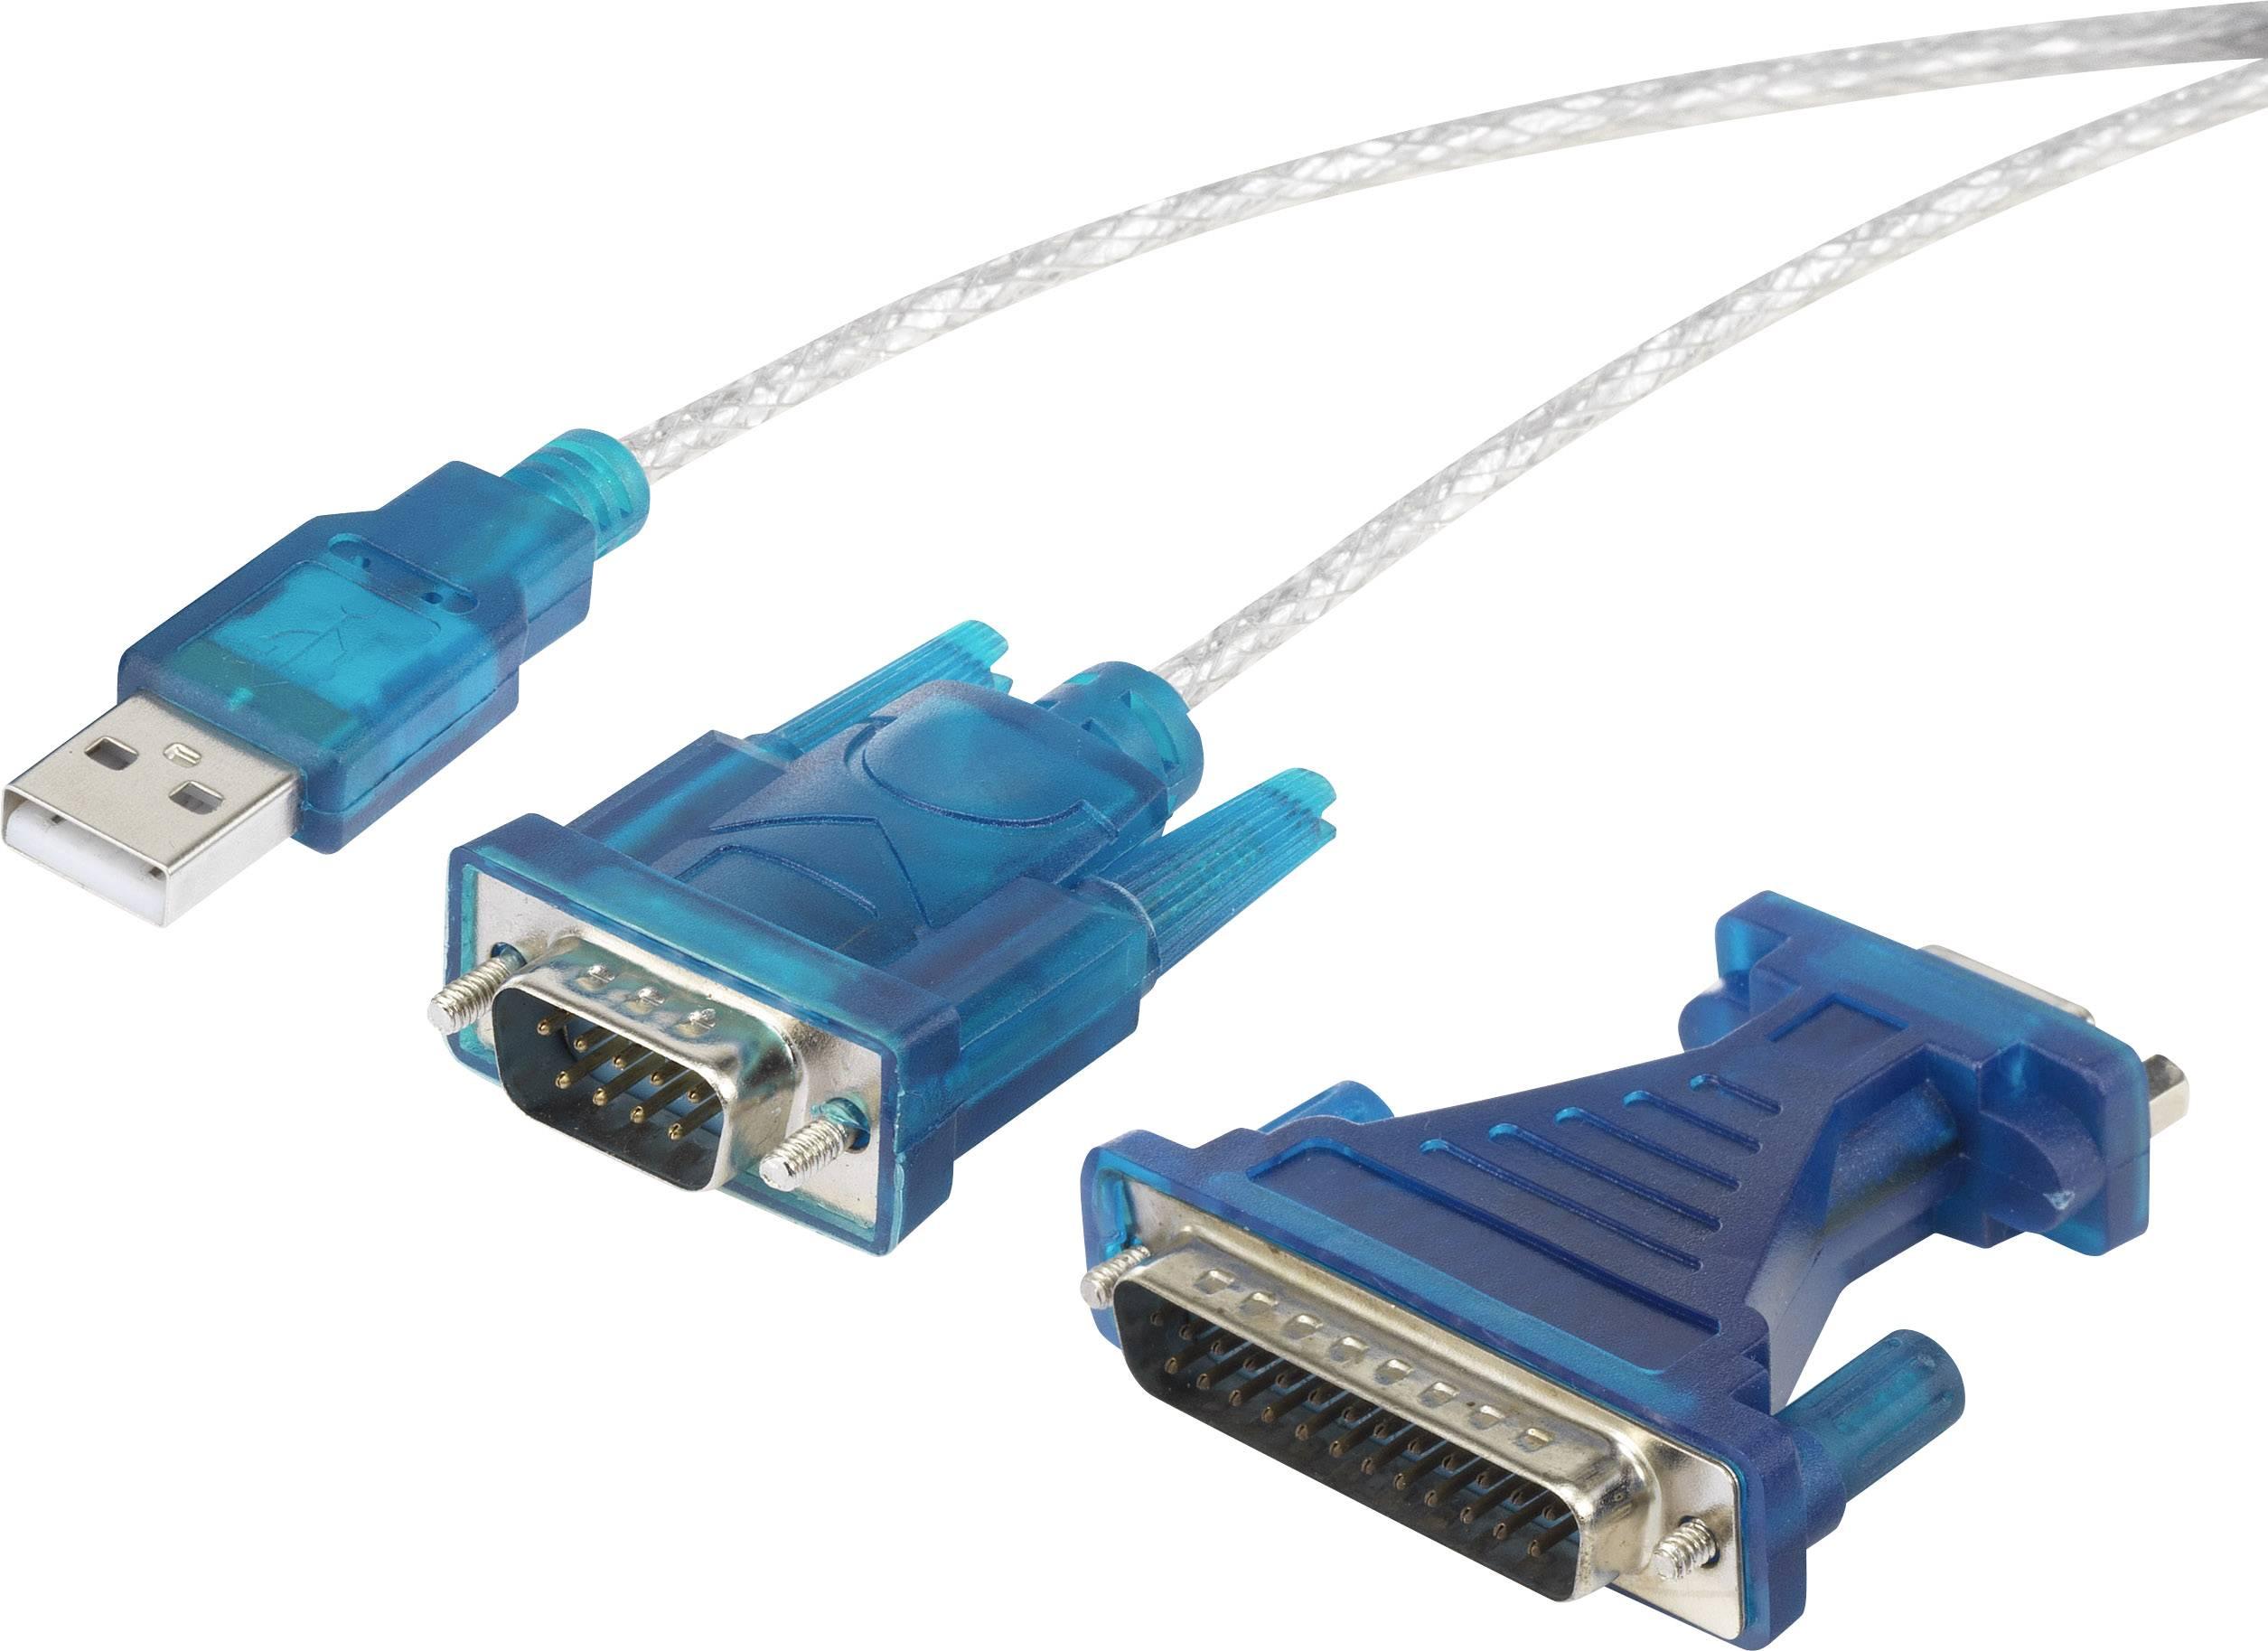 Adaptér USB Renkforce [1x D-SUB zástrčka 9pólová, D-SUB zástrčka 25pólová - 1x USB 1.1 zástrčka A], černá